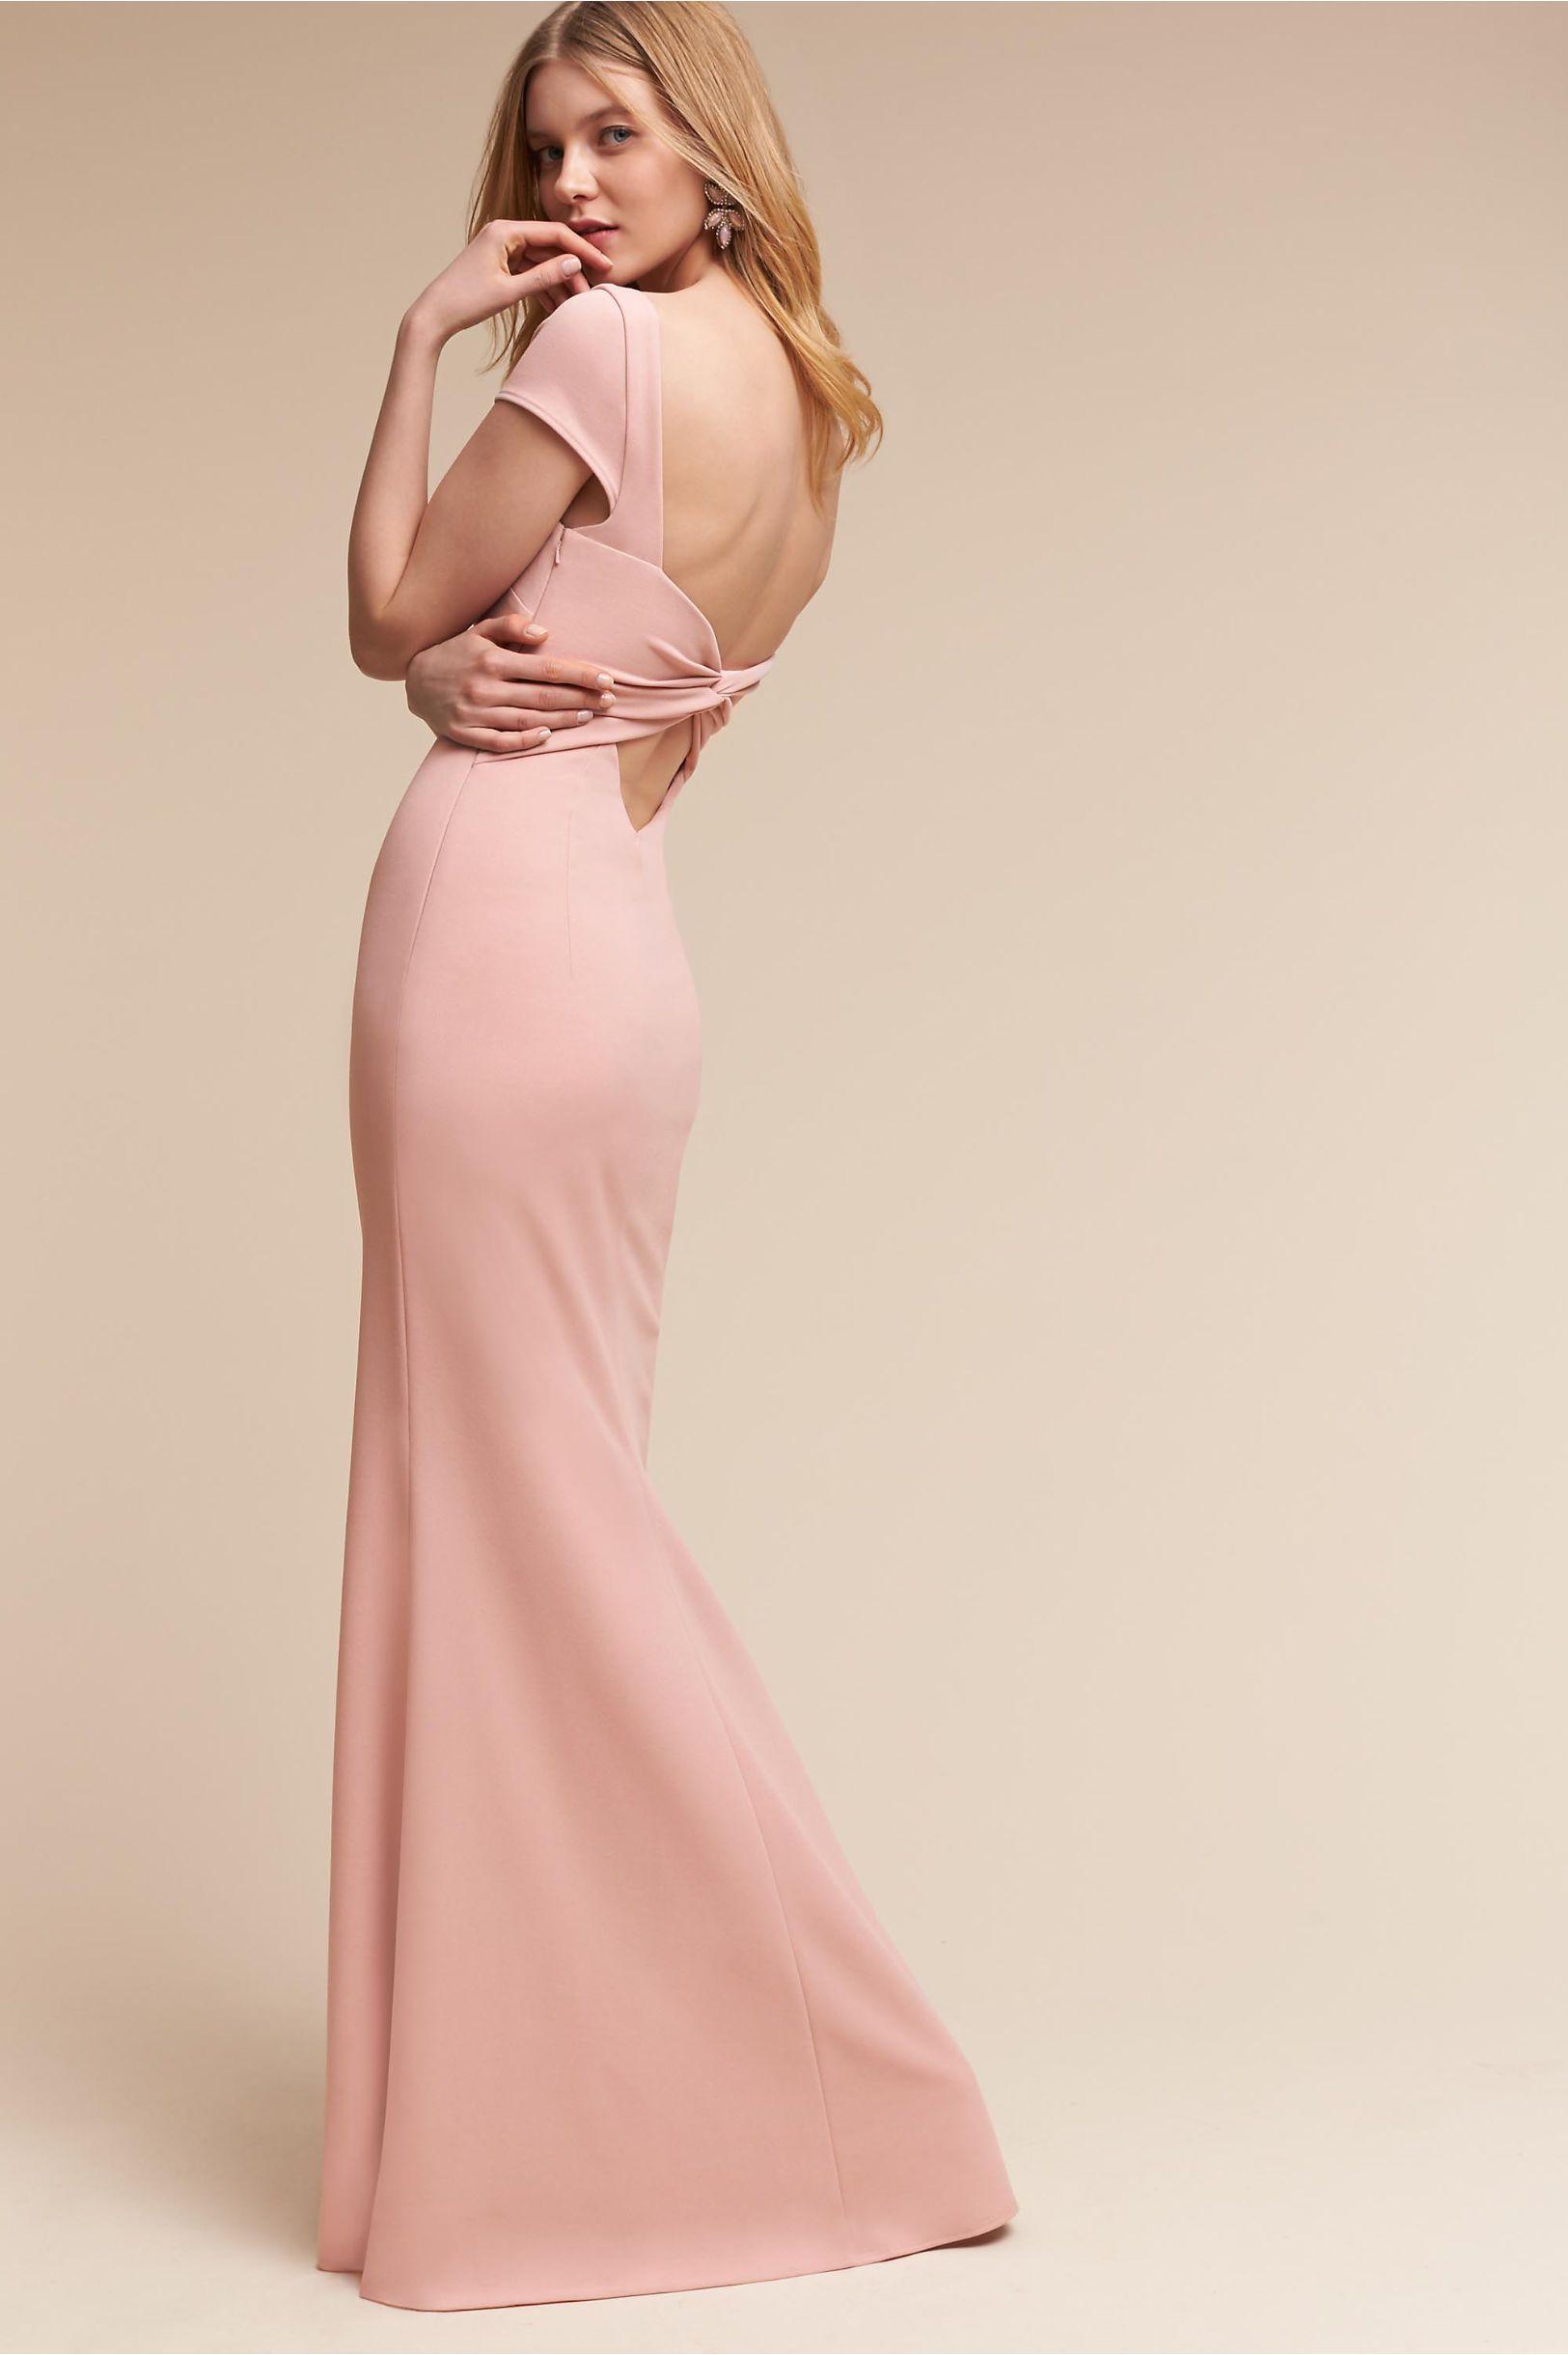 BHLDN\'s Madison Dress in Dusty Rose